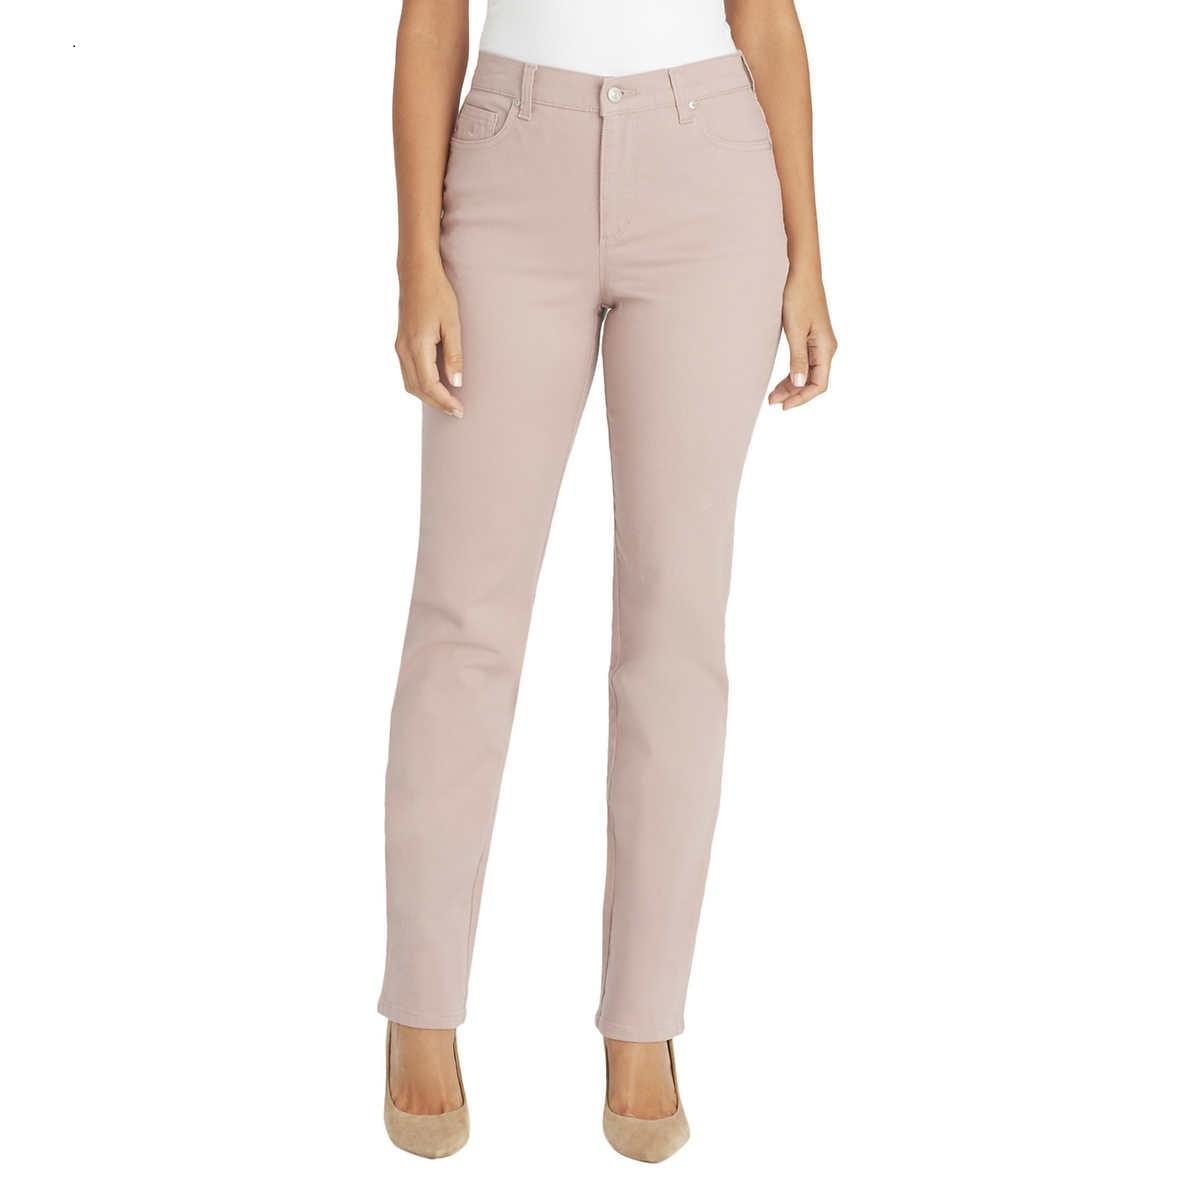 Gloria Vanderbilt Ladies Denim Average Length Jeans - Woodrose 6